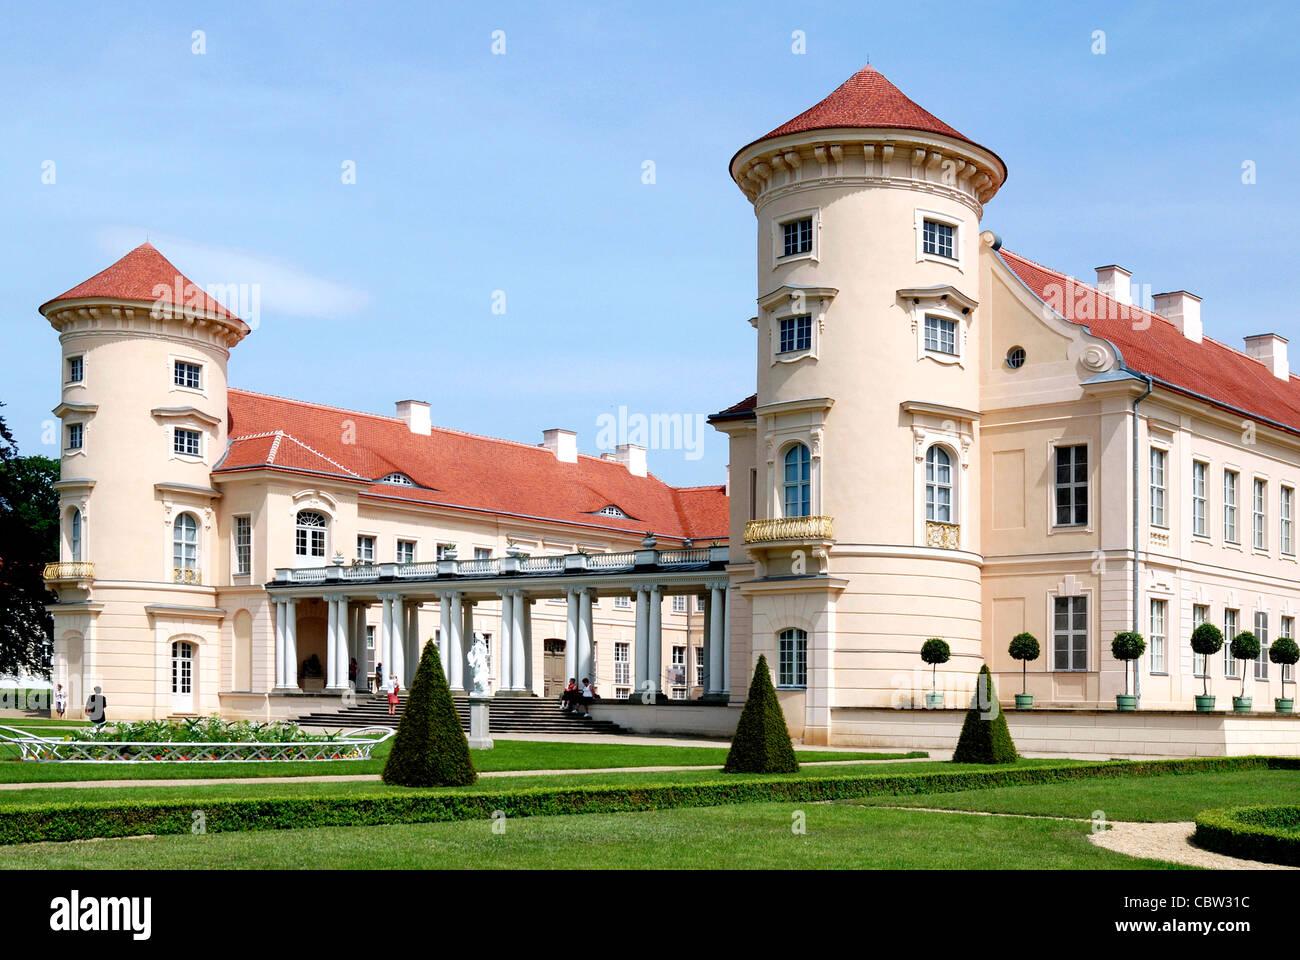 Rheinsberg castle at the Grienericksee in Brandenburg. - Stock Image